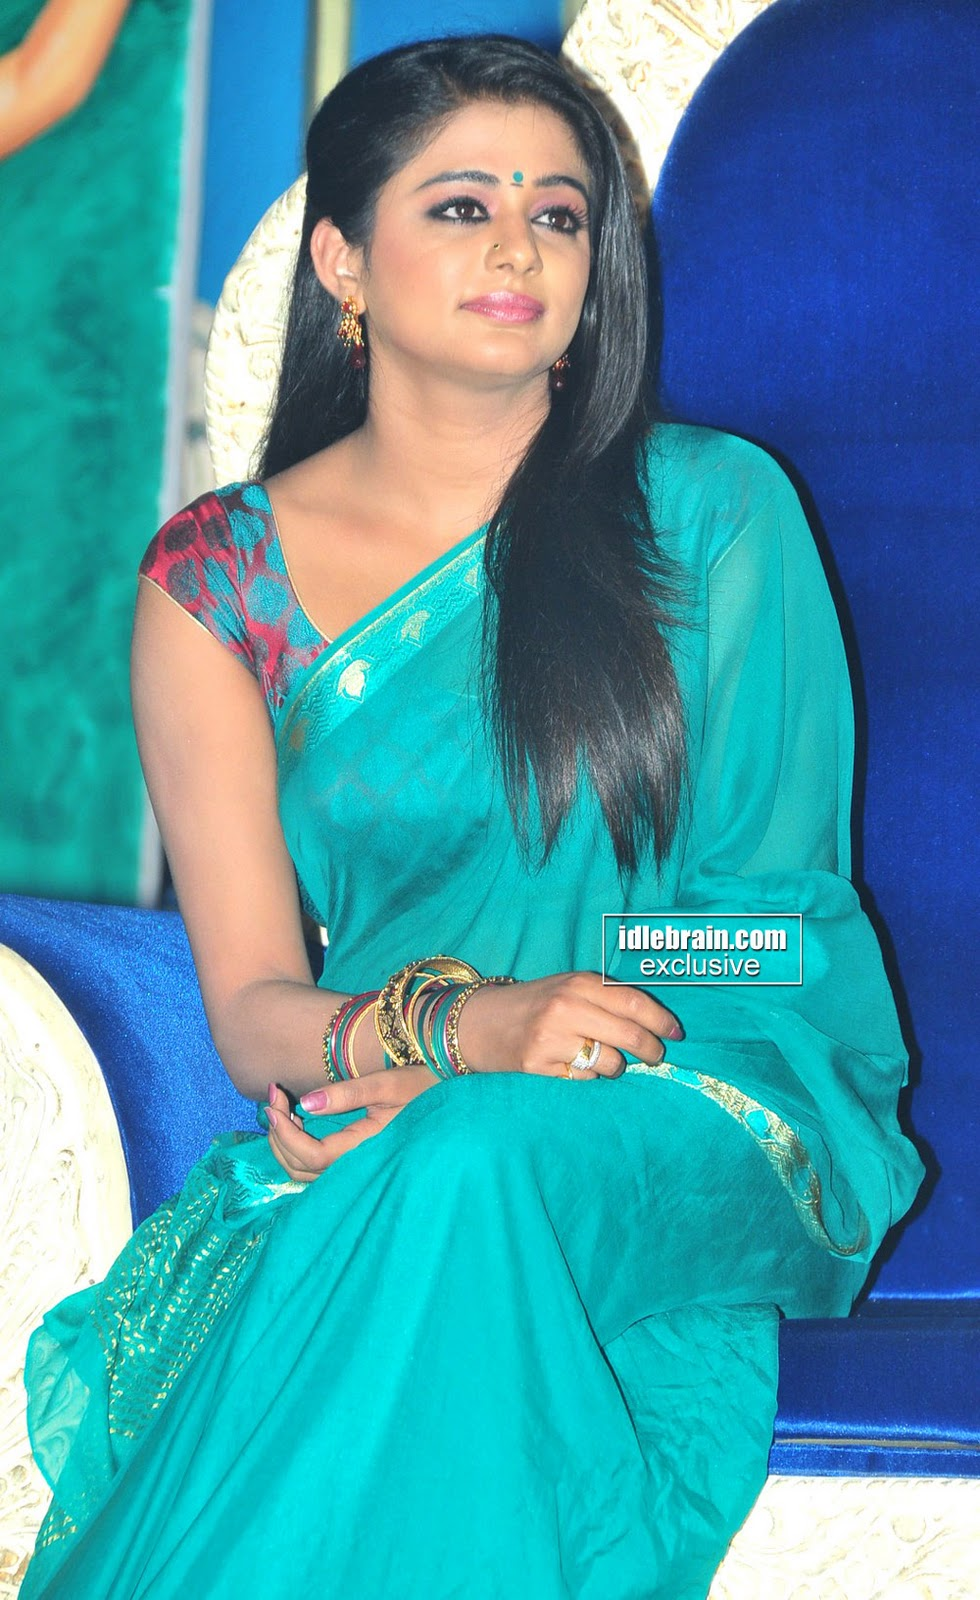 South Actress Hot Priyamani S In Sey Saree